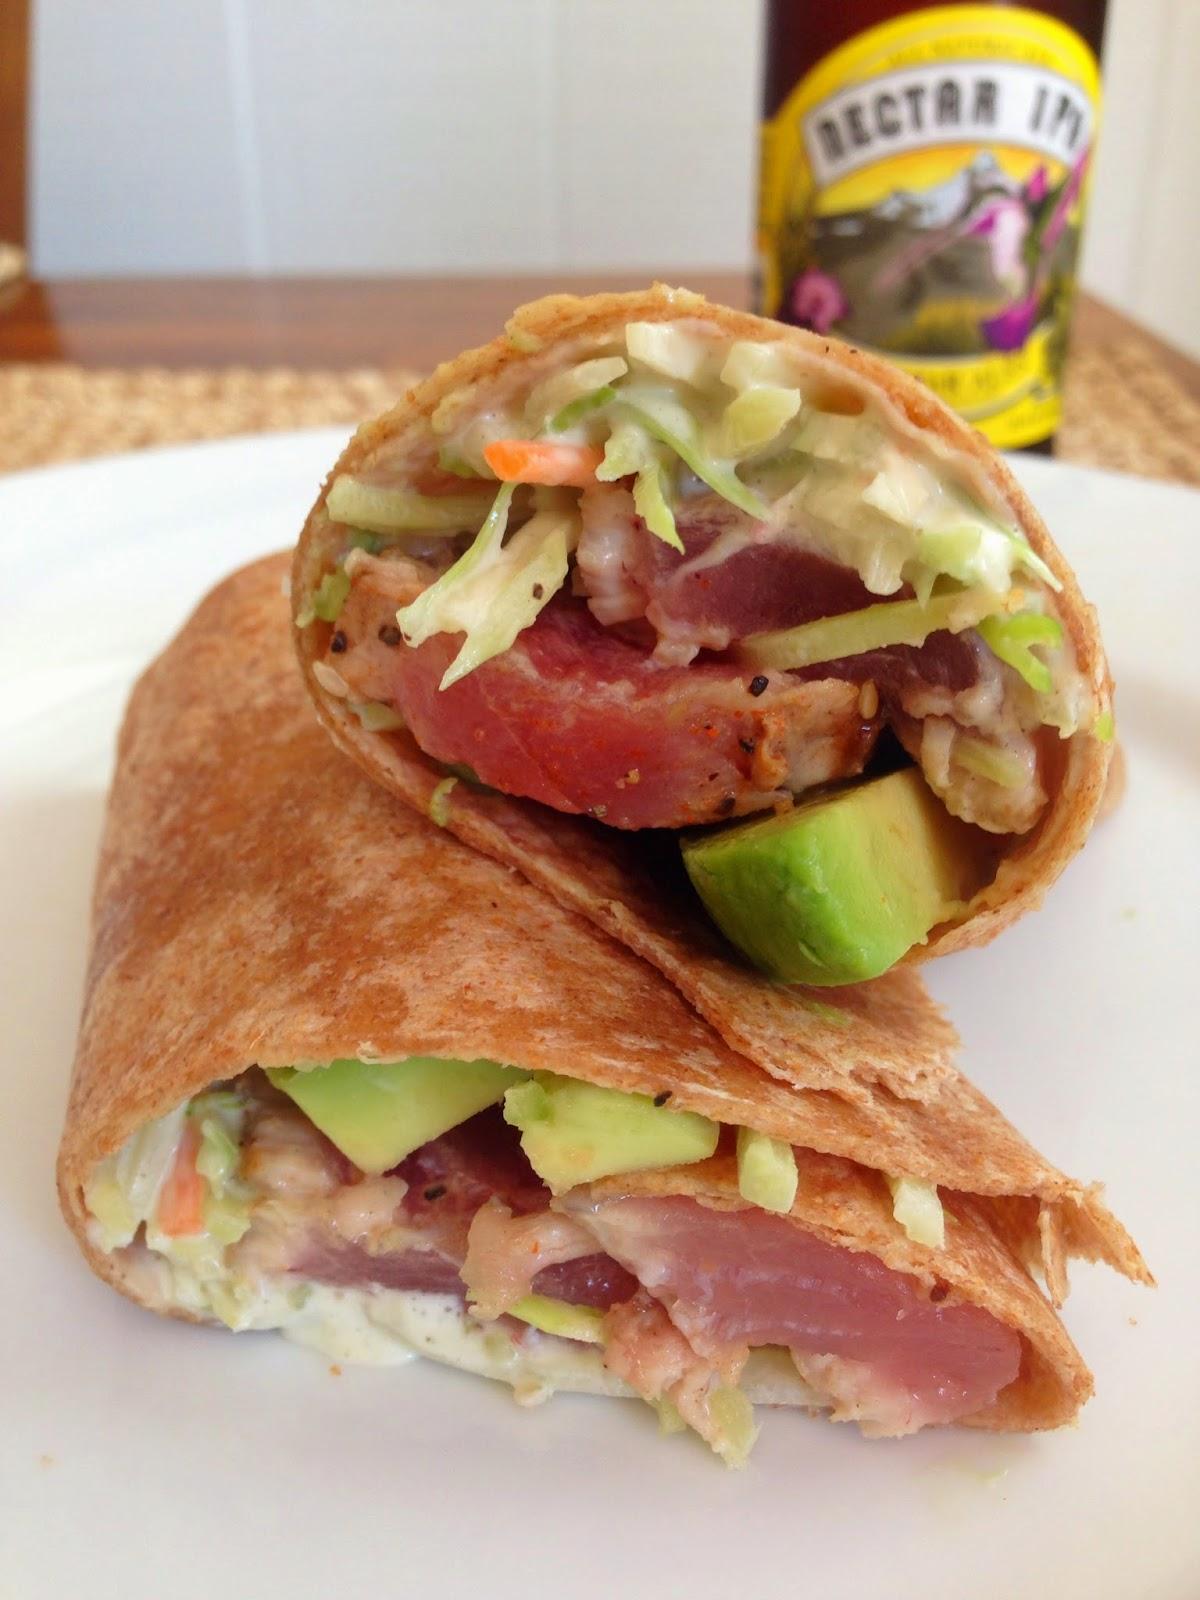 taylor made: seared ahi tuna wraps with wasabi mayo slaw & avocado